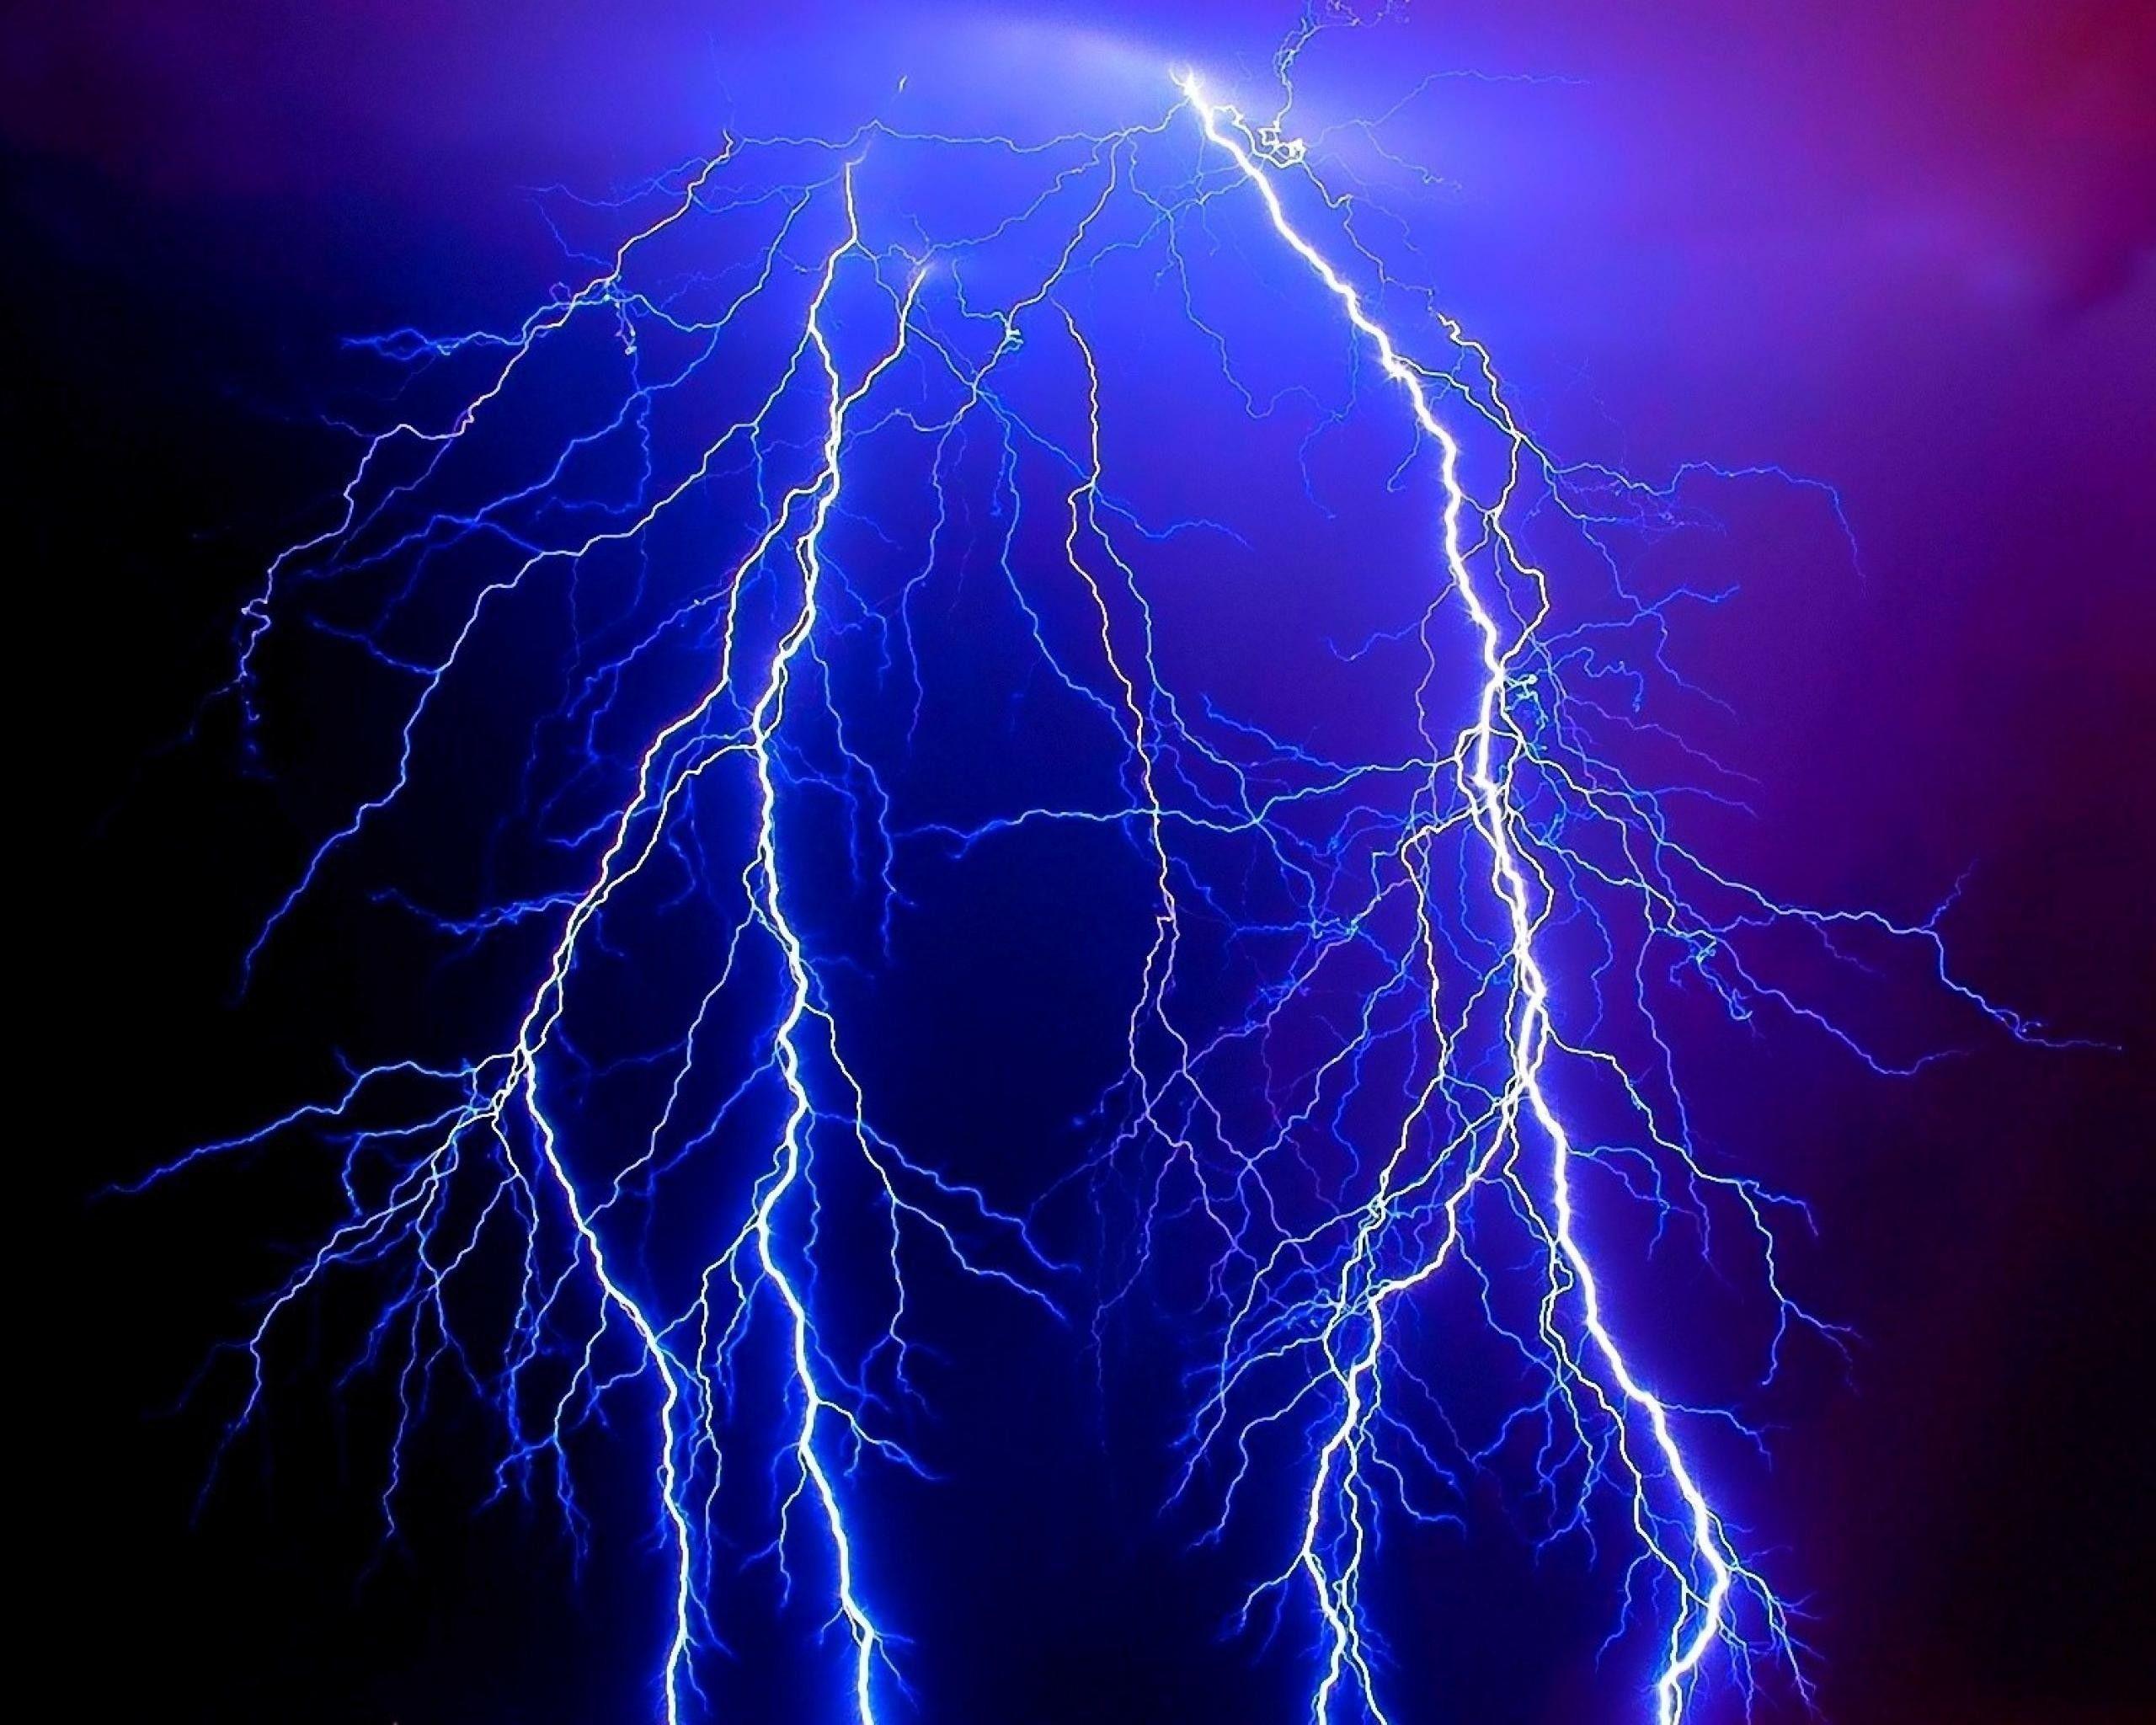 Blue Lightning Wallpapers Top Free Blue Lightning Backgrounds Wallpaperaccess